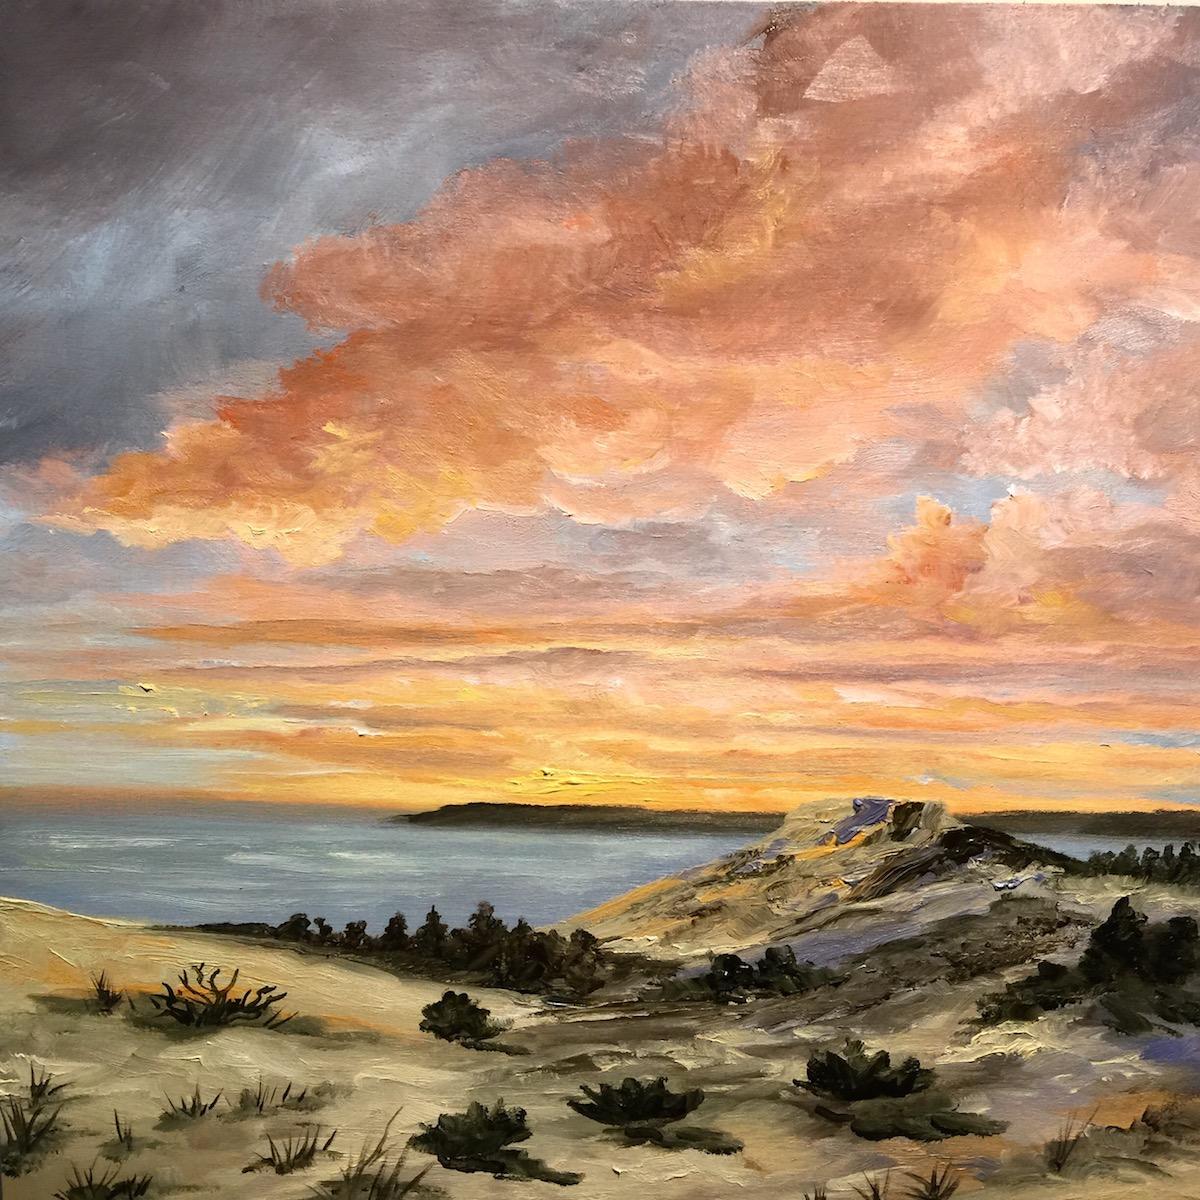 Sleeping Bear Trail Painting - Stephanie Schlatter